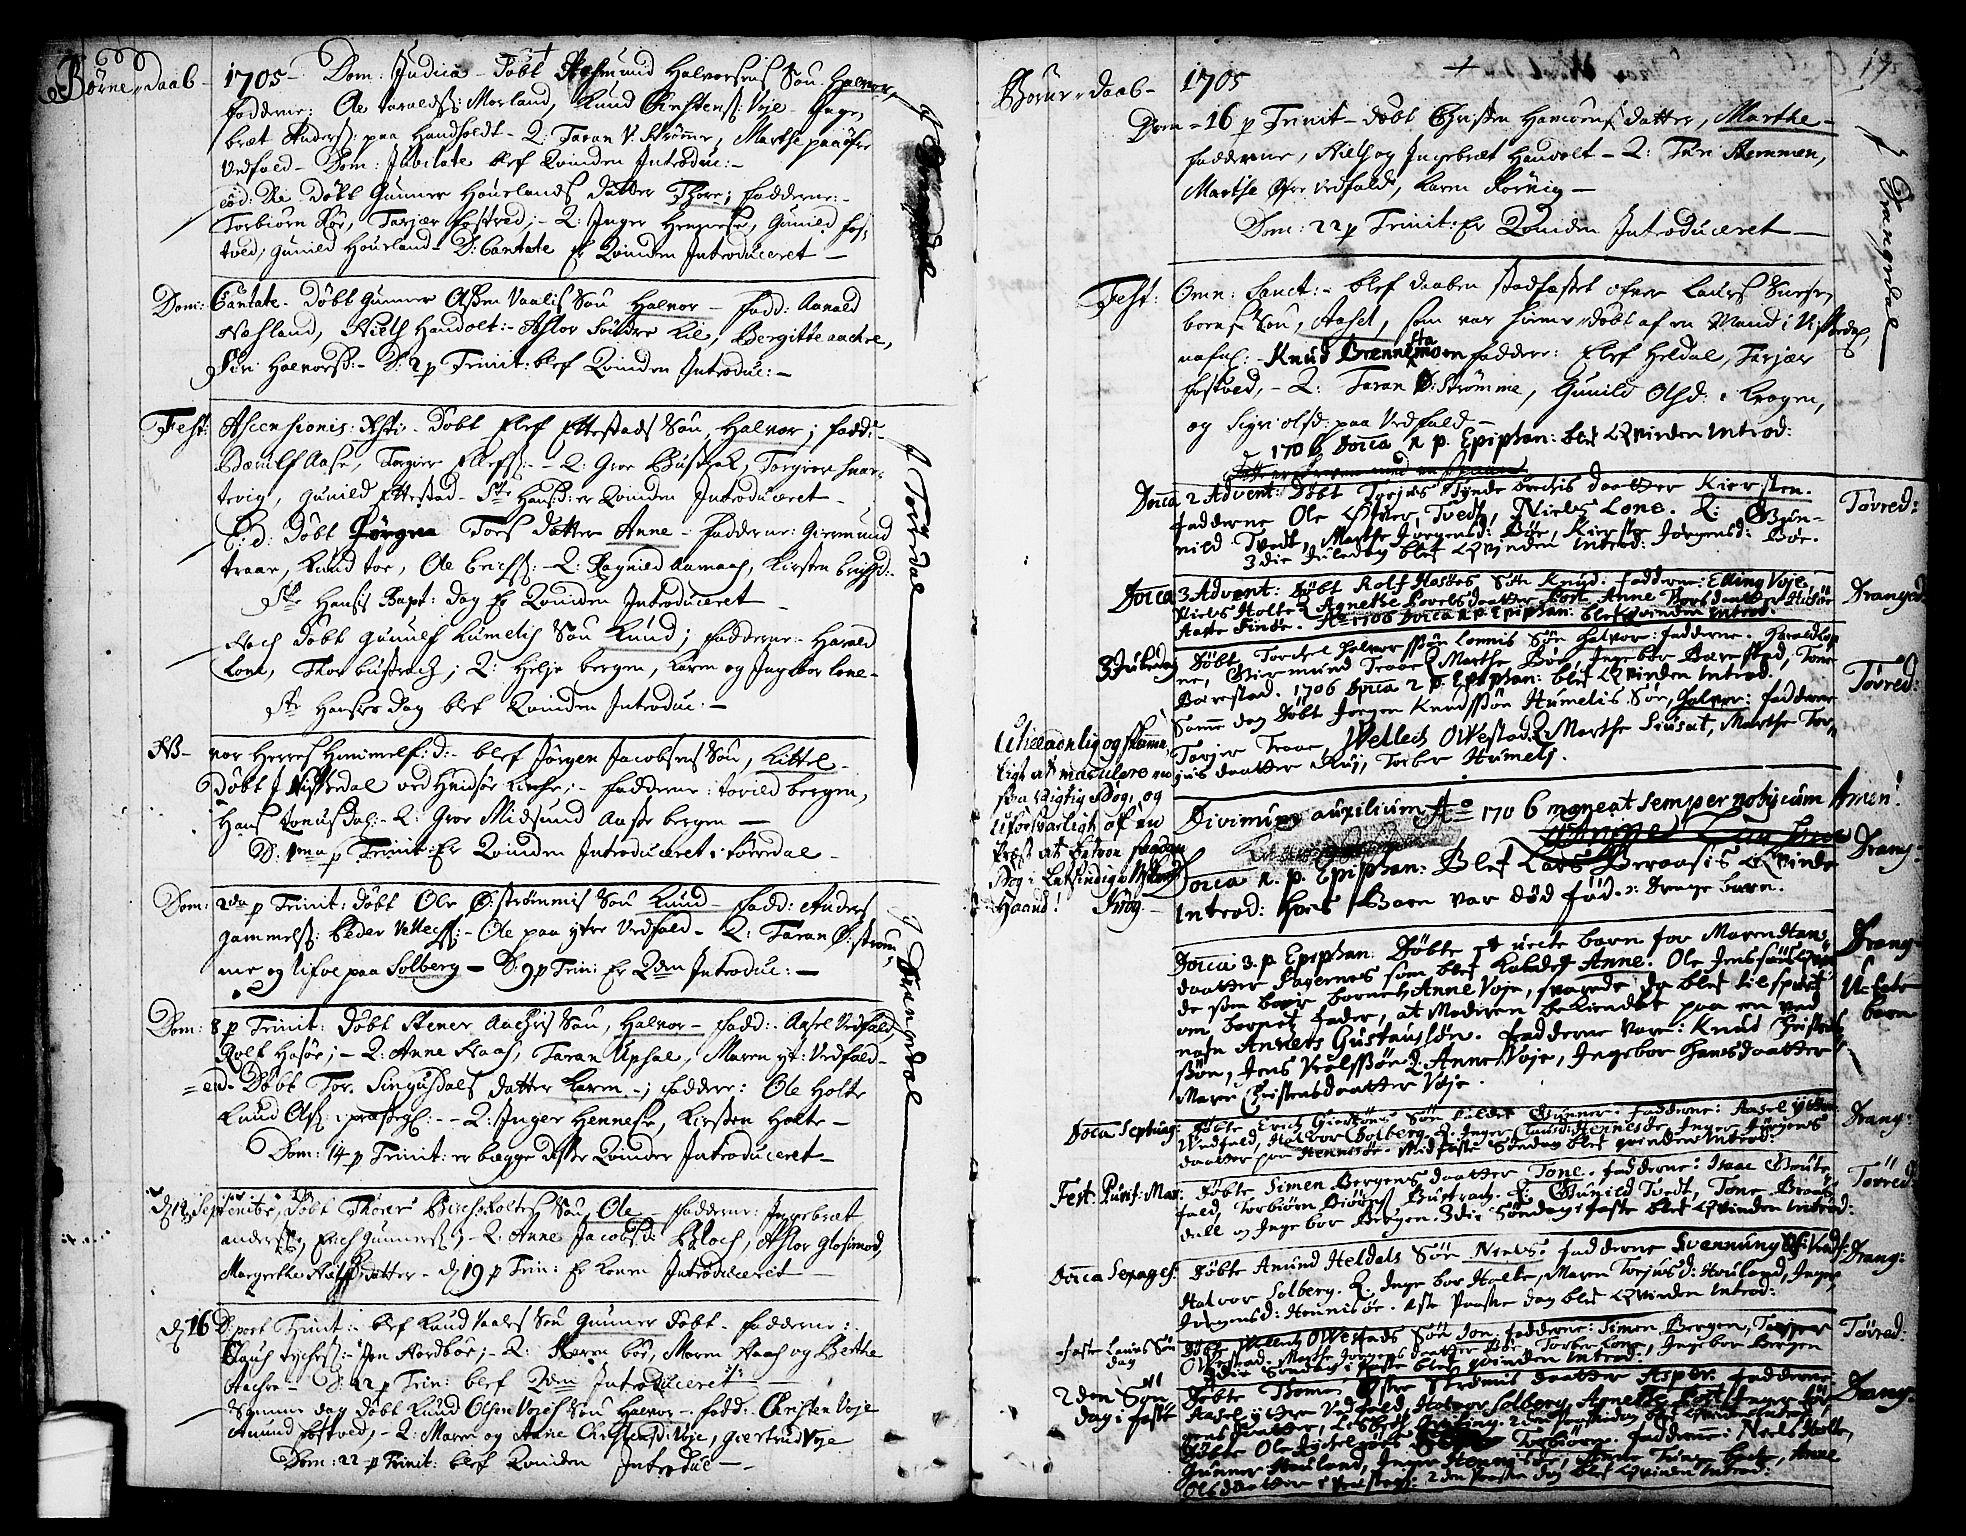 SAKO, Drangedal kirkebøker, F/Fa/L0001: Ministerialbok nr. 1, 1697-1767, s. 17